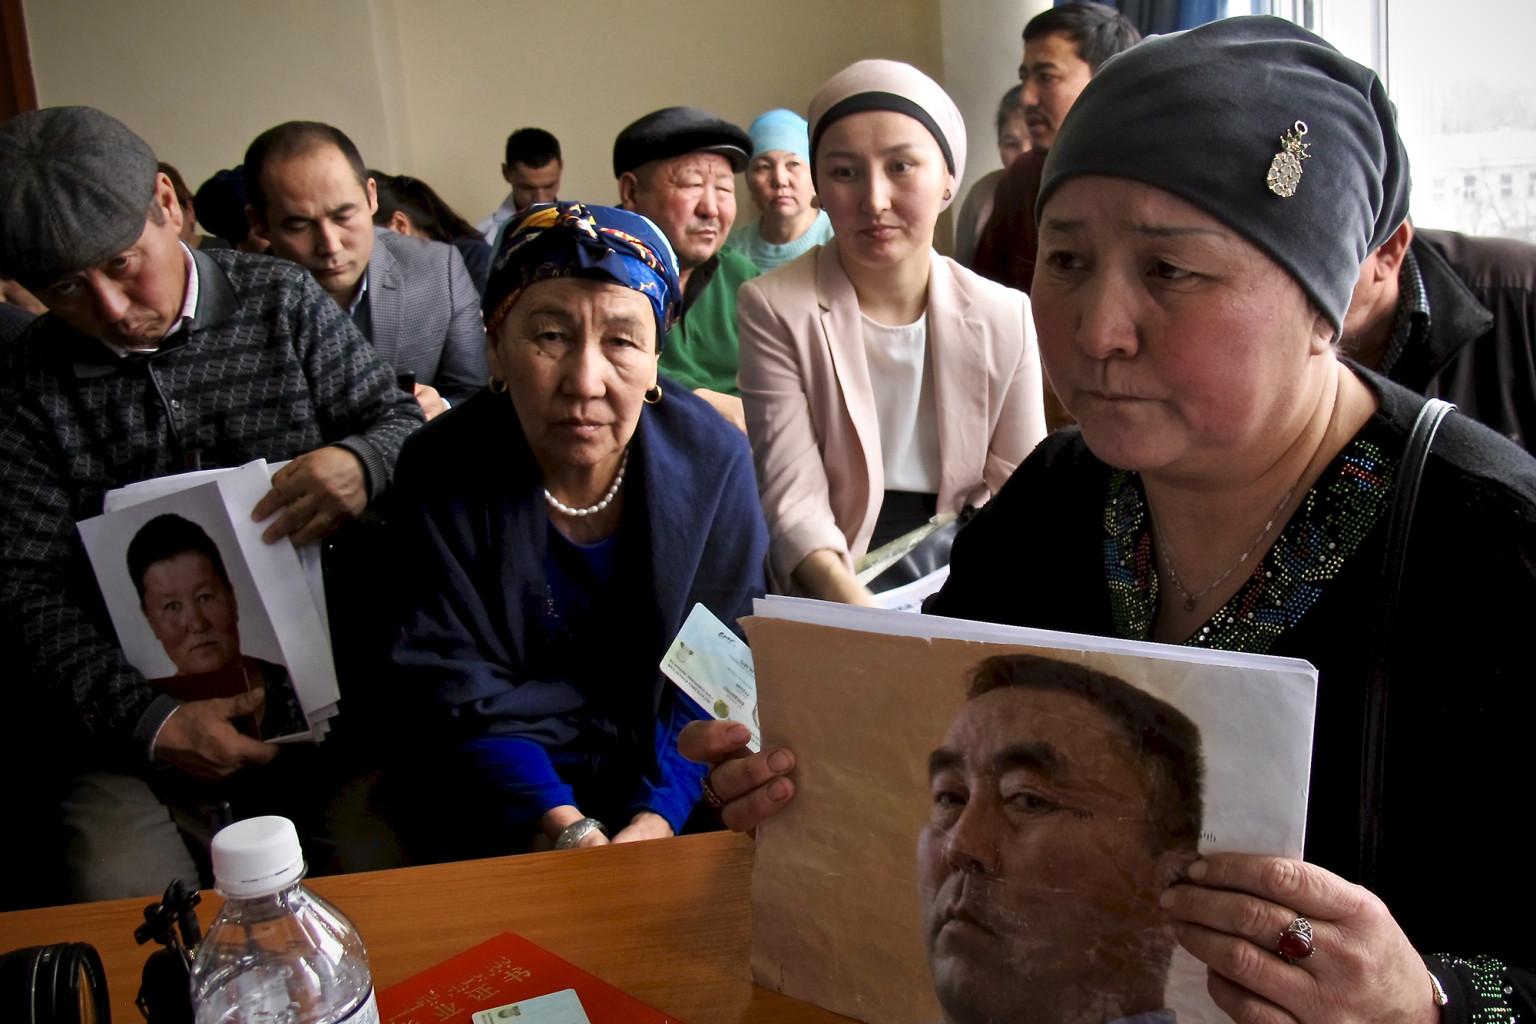 Kazakhs Won't Be Silenced on China's Internment Camps